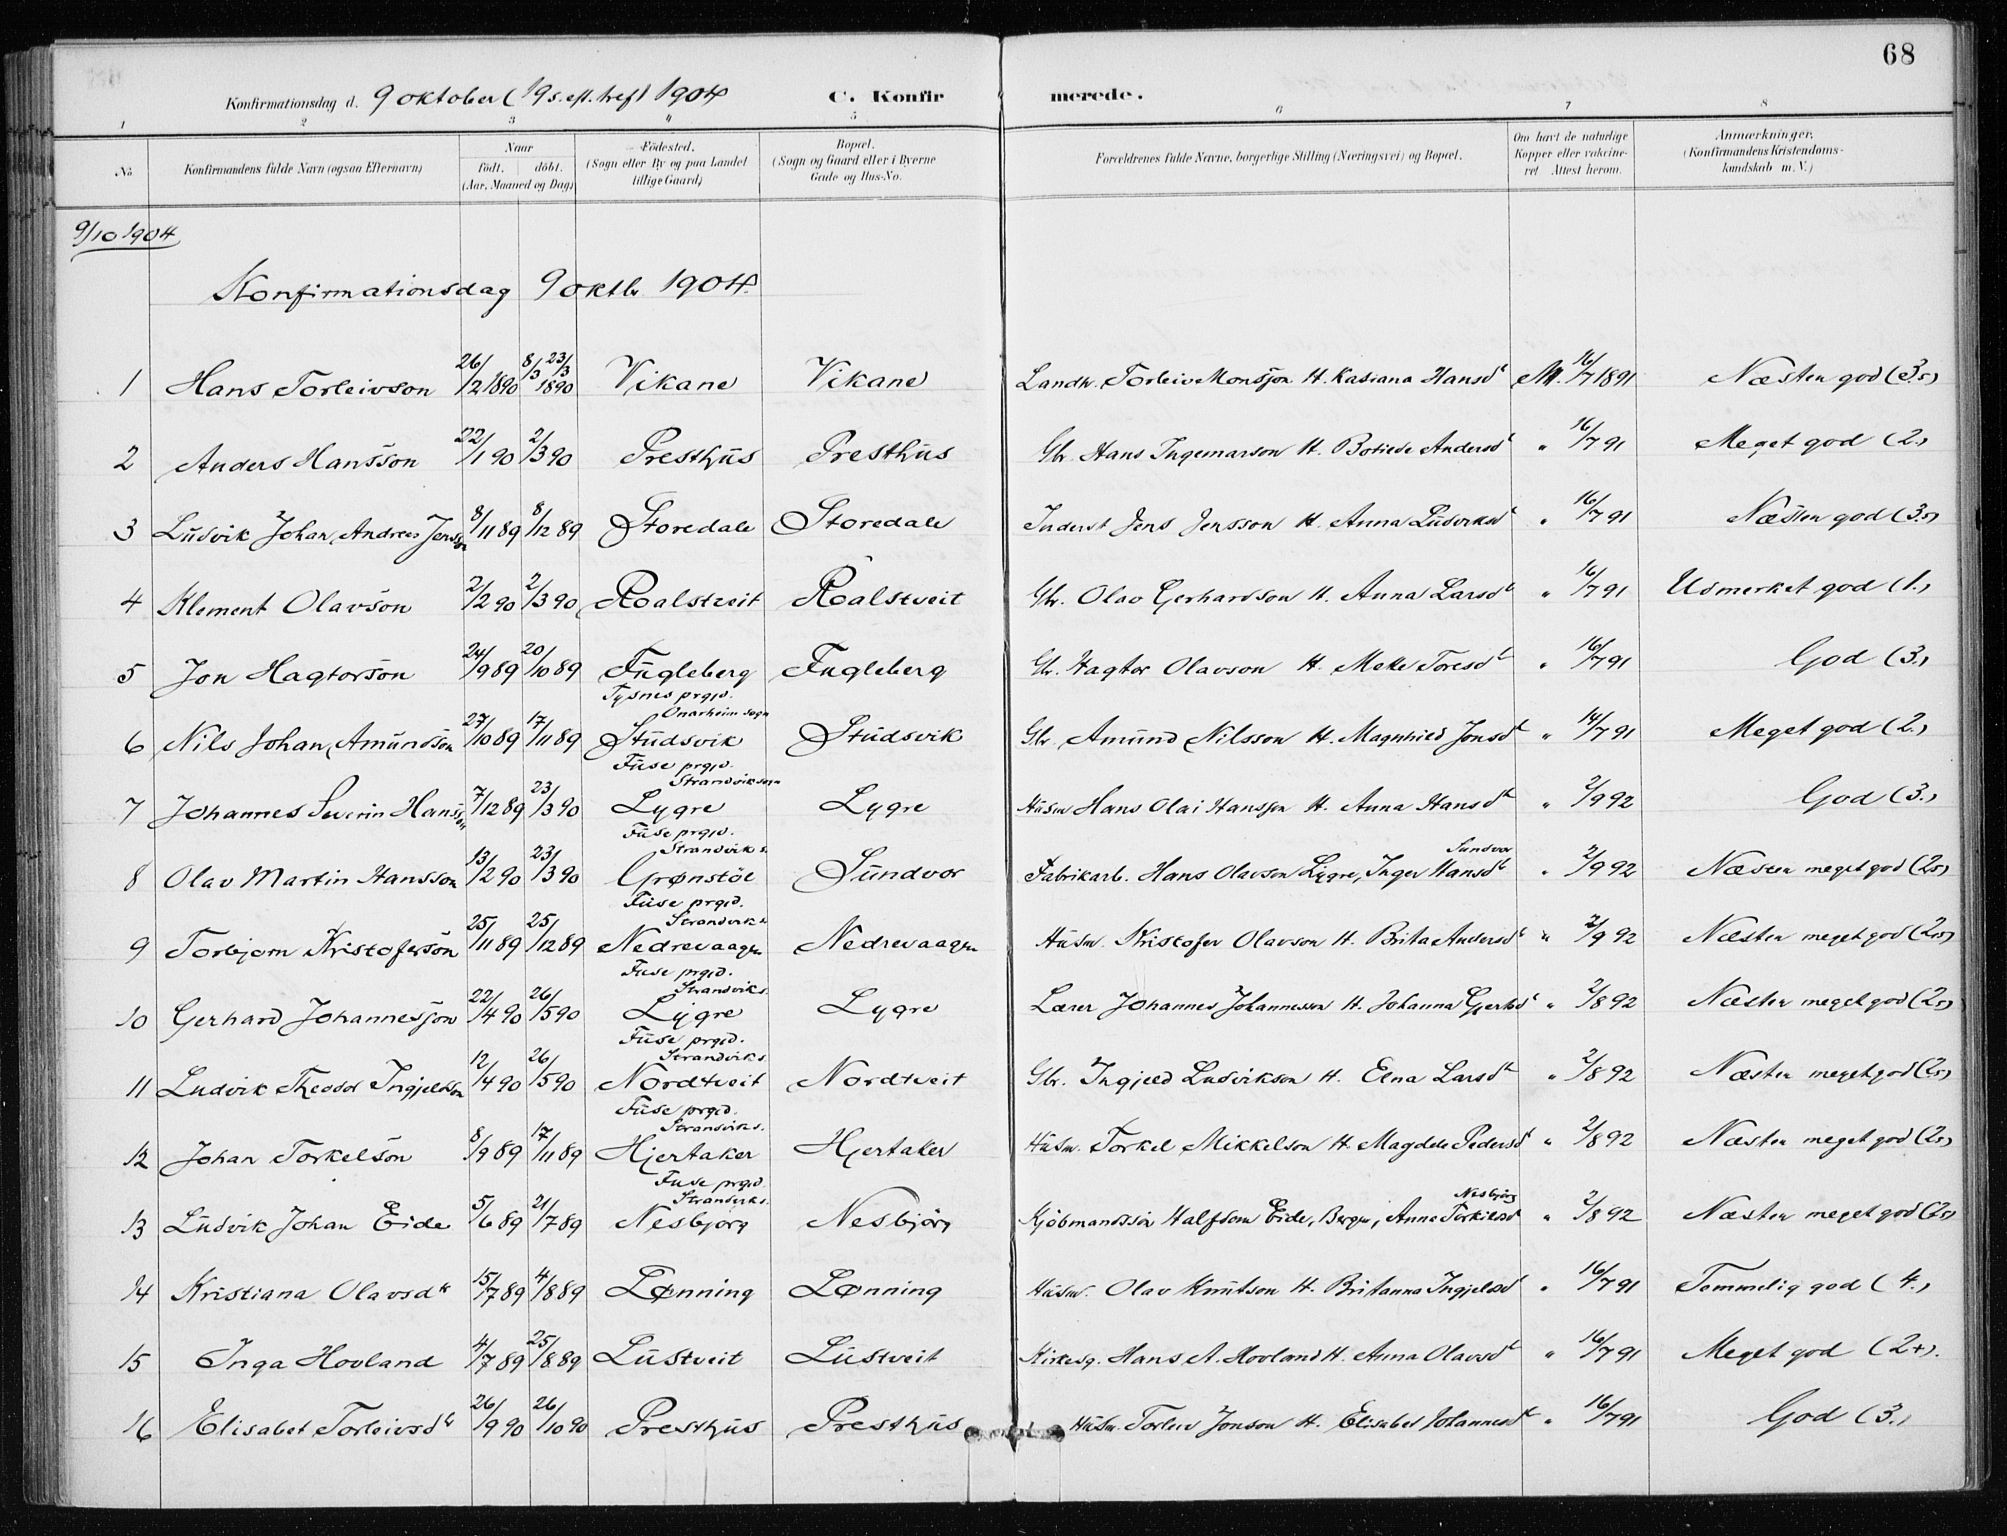 SAB, Kvinnherad Sokneprestembete, H/Haa: Ministerialbok nr. E 1, 1887-1912, s. 68